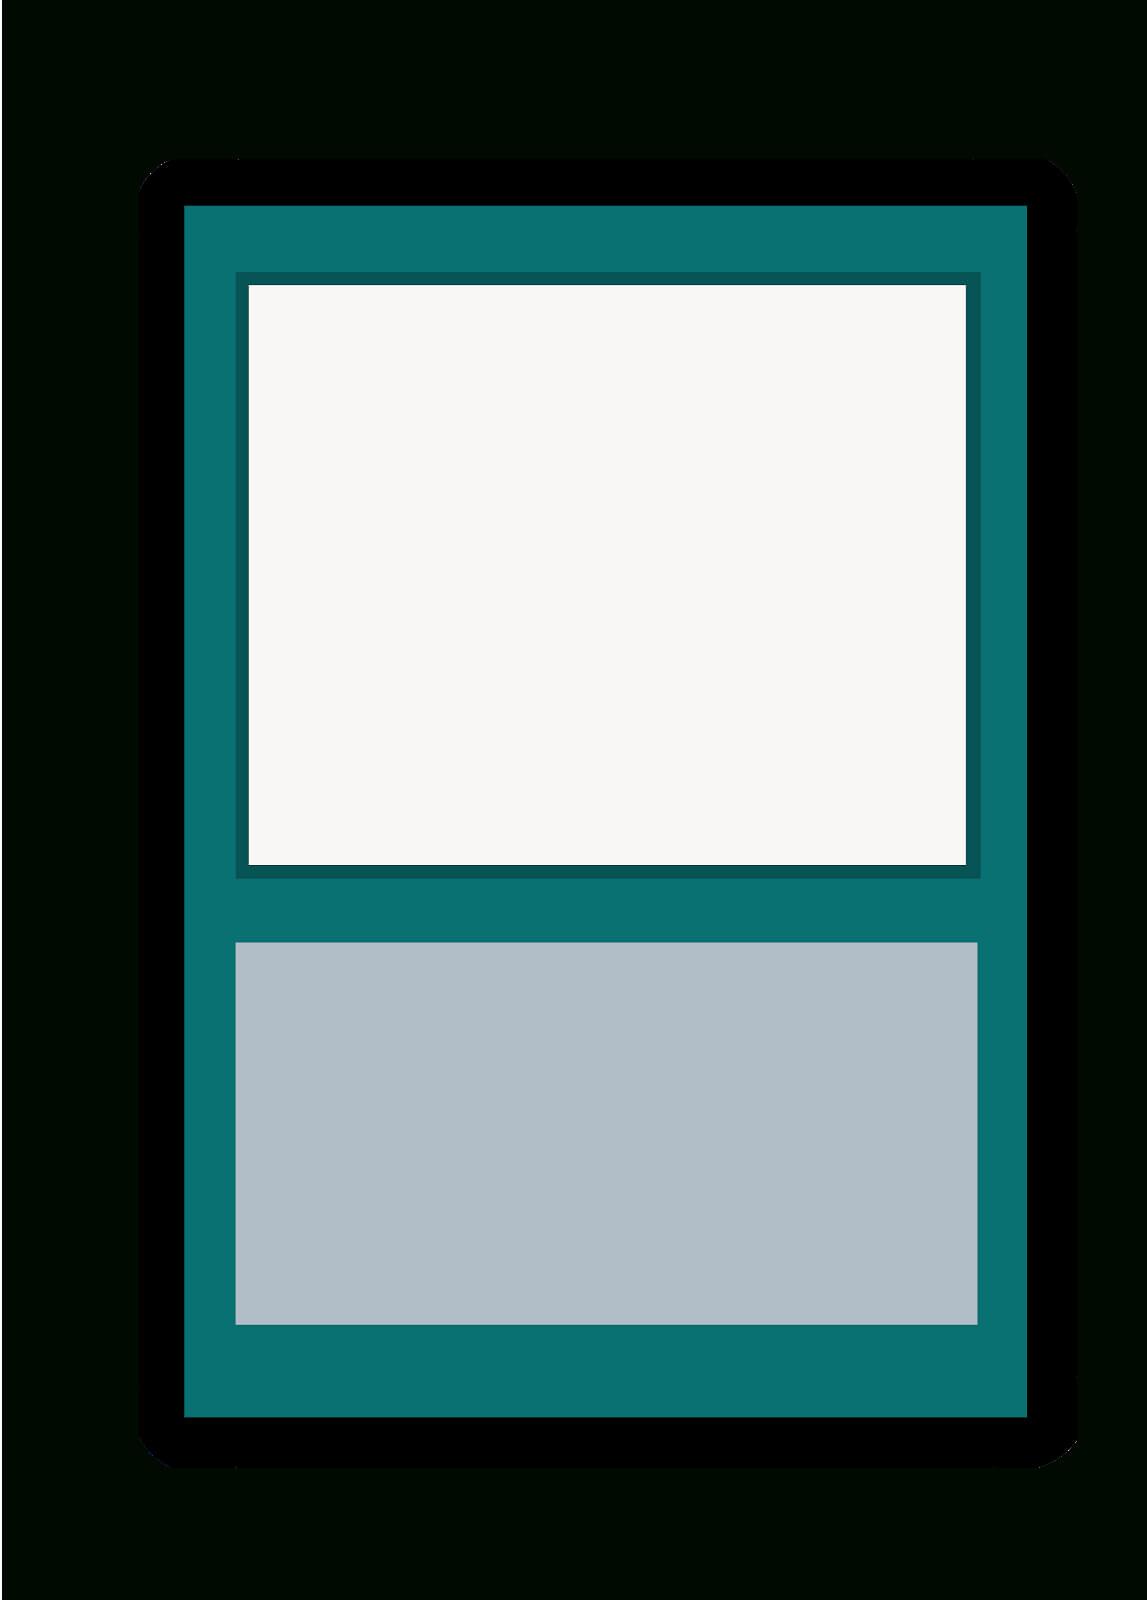 8.bit.love.child: Blank Magic: The Gathering Card Template Regarding Magic The Gathering Card Template